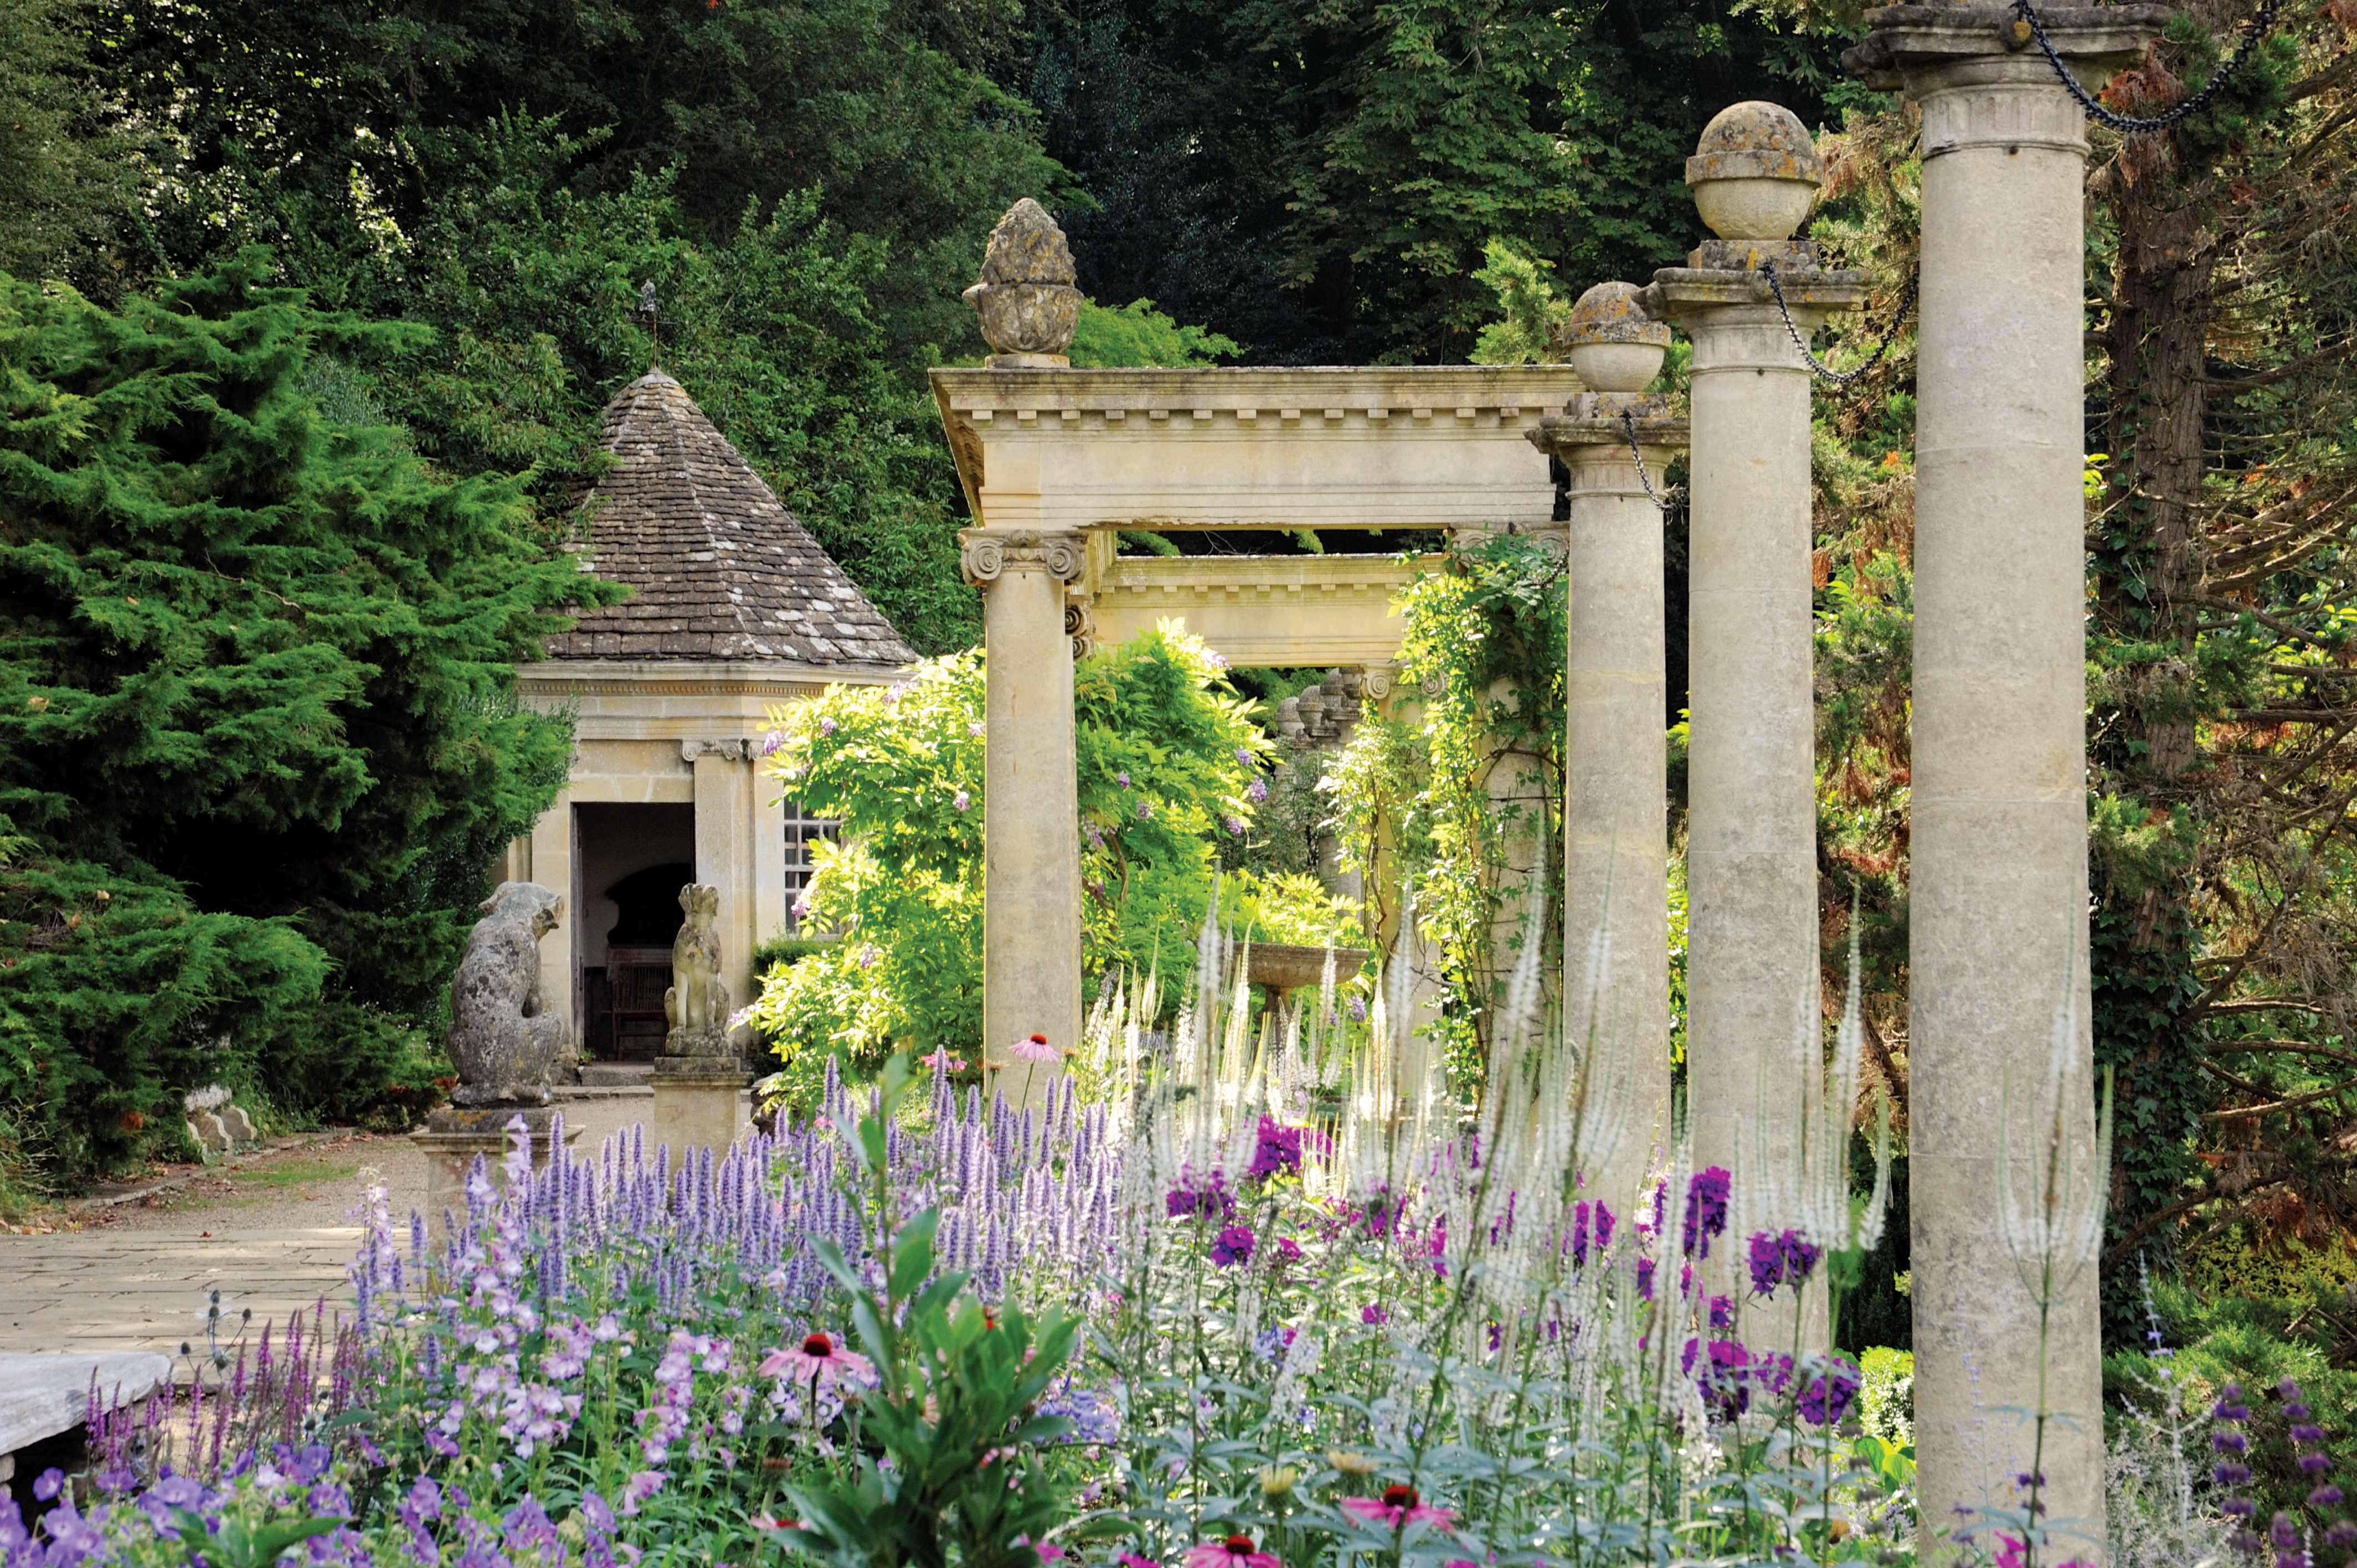 Iford Manor — The Peto Garden